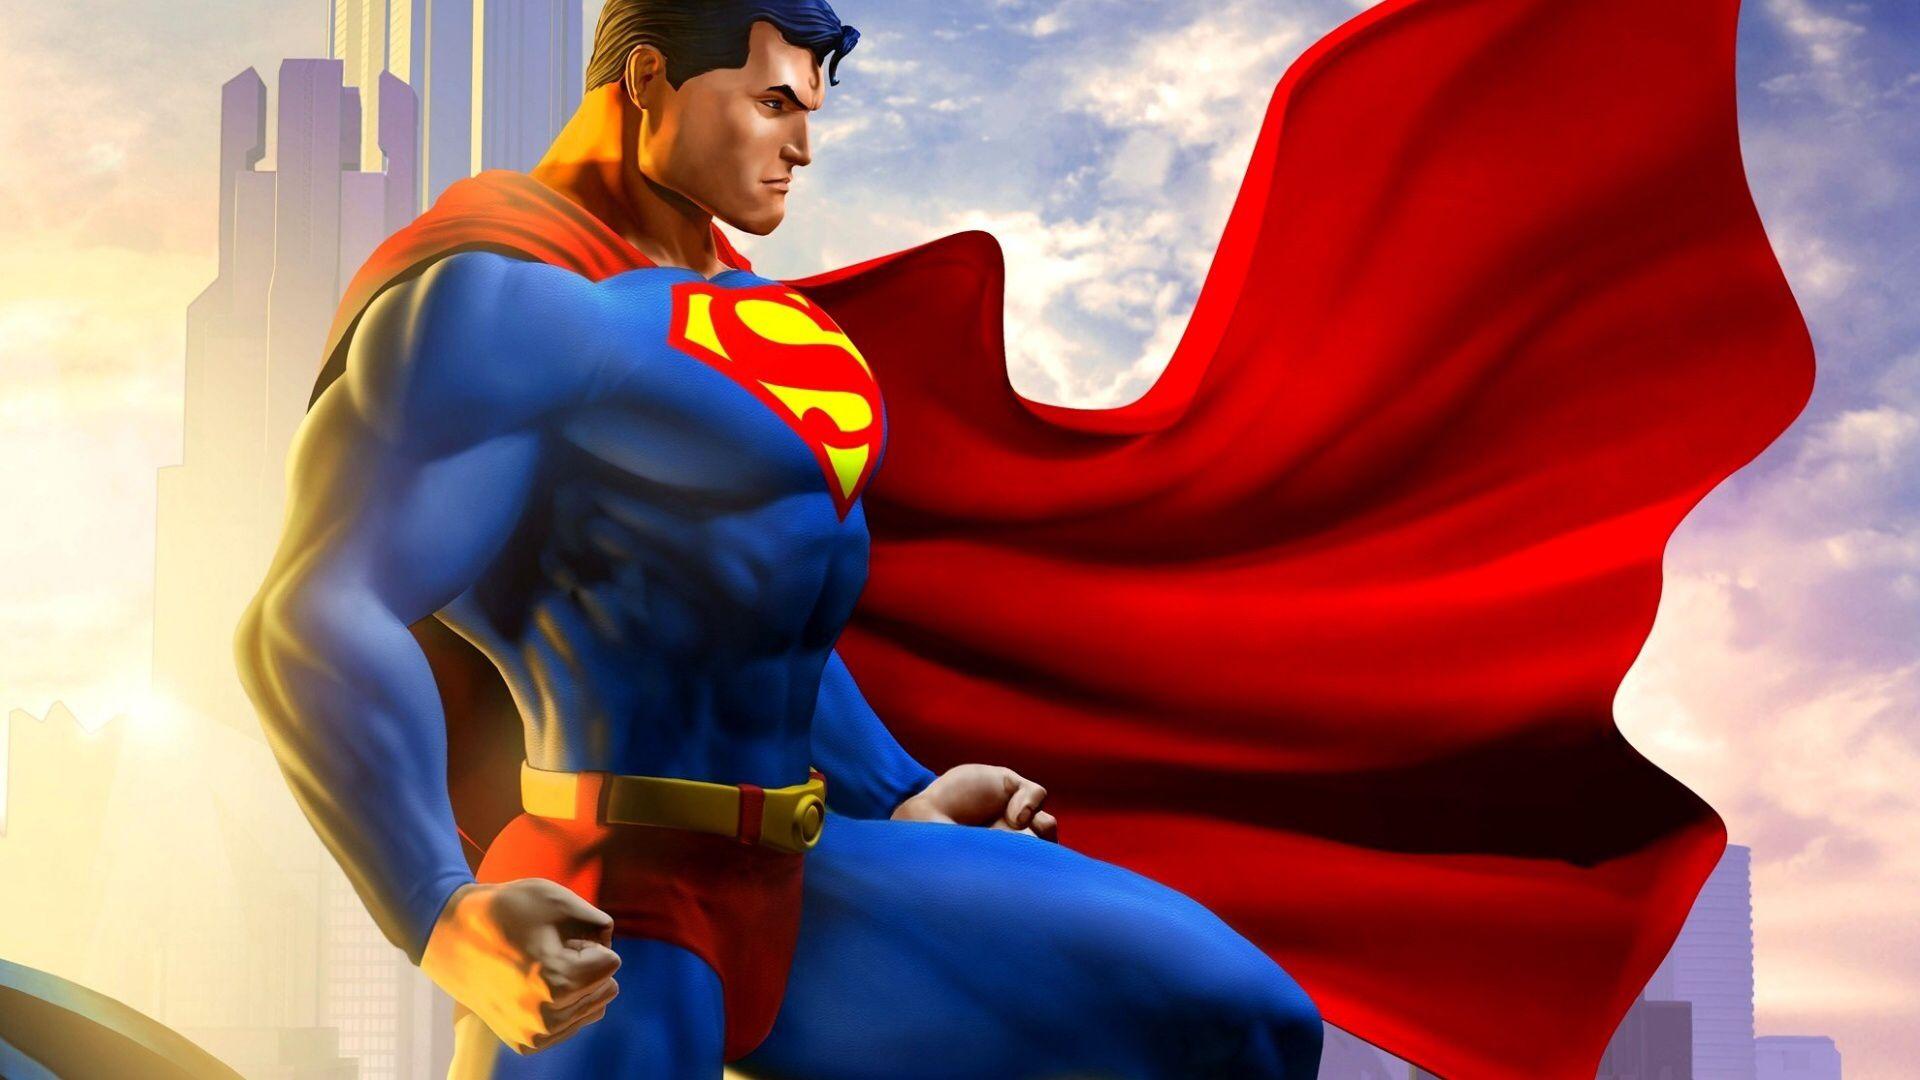 Billede fra http://static.comicvine.com/uploads/original/13/138572/2824589-13260-gamesrocks-superman.jpg.